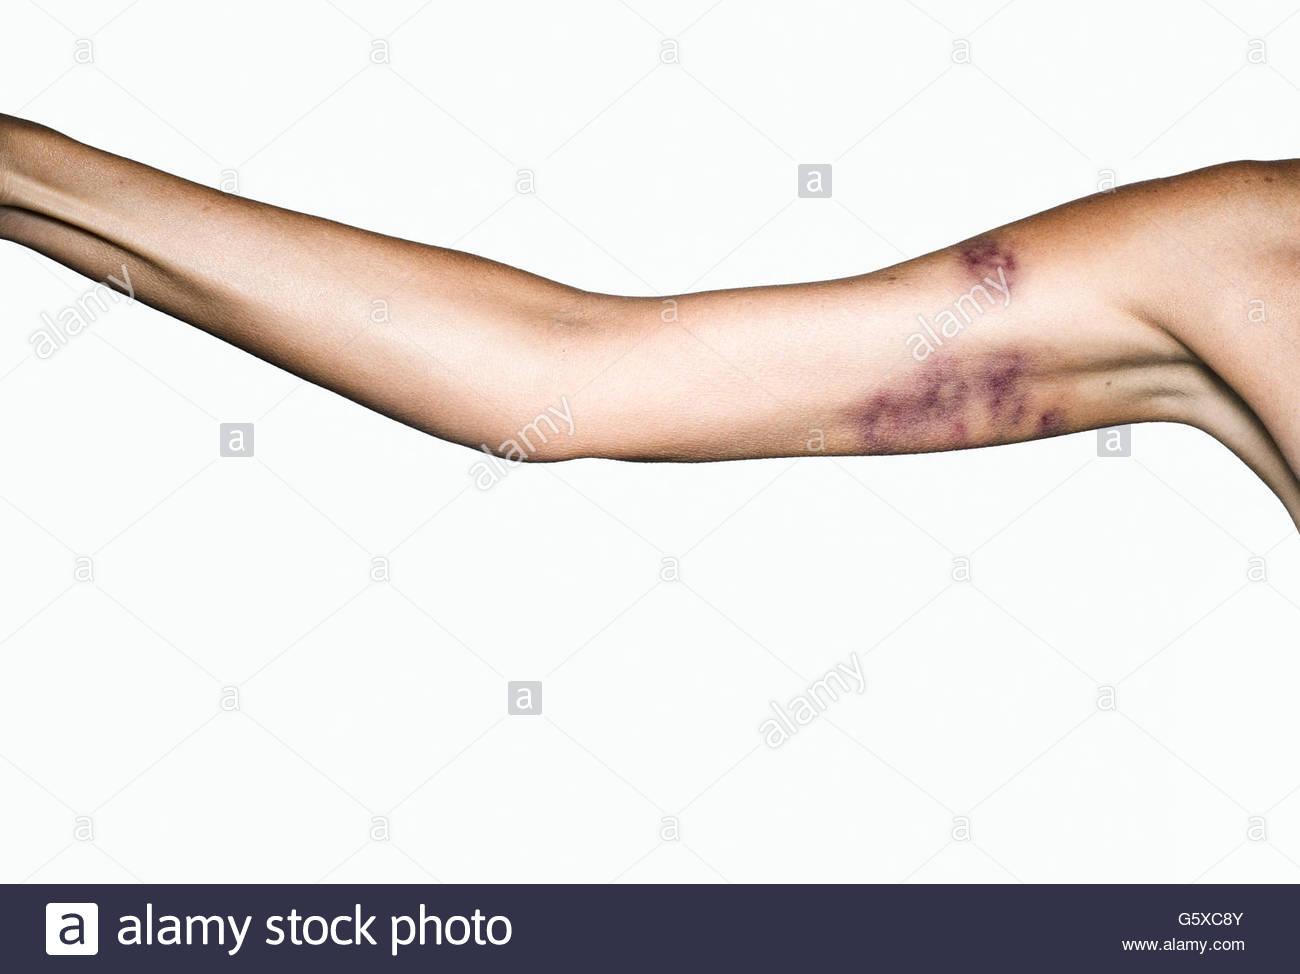 Bruised female arm - Stock Image